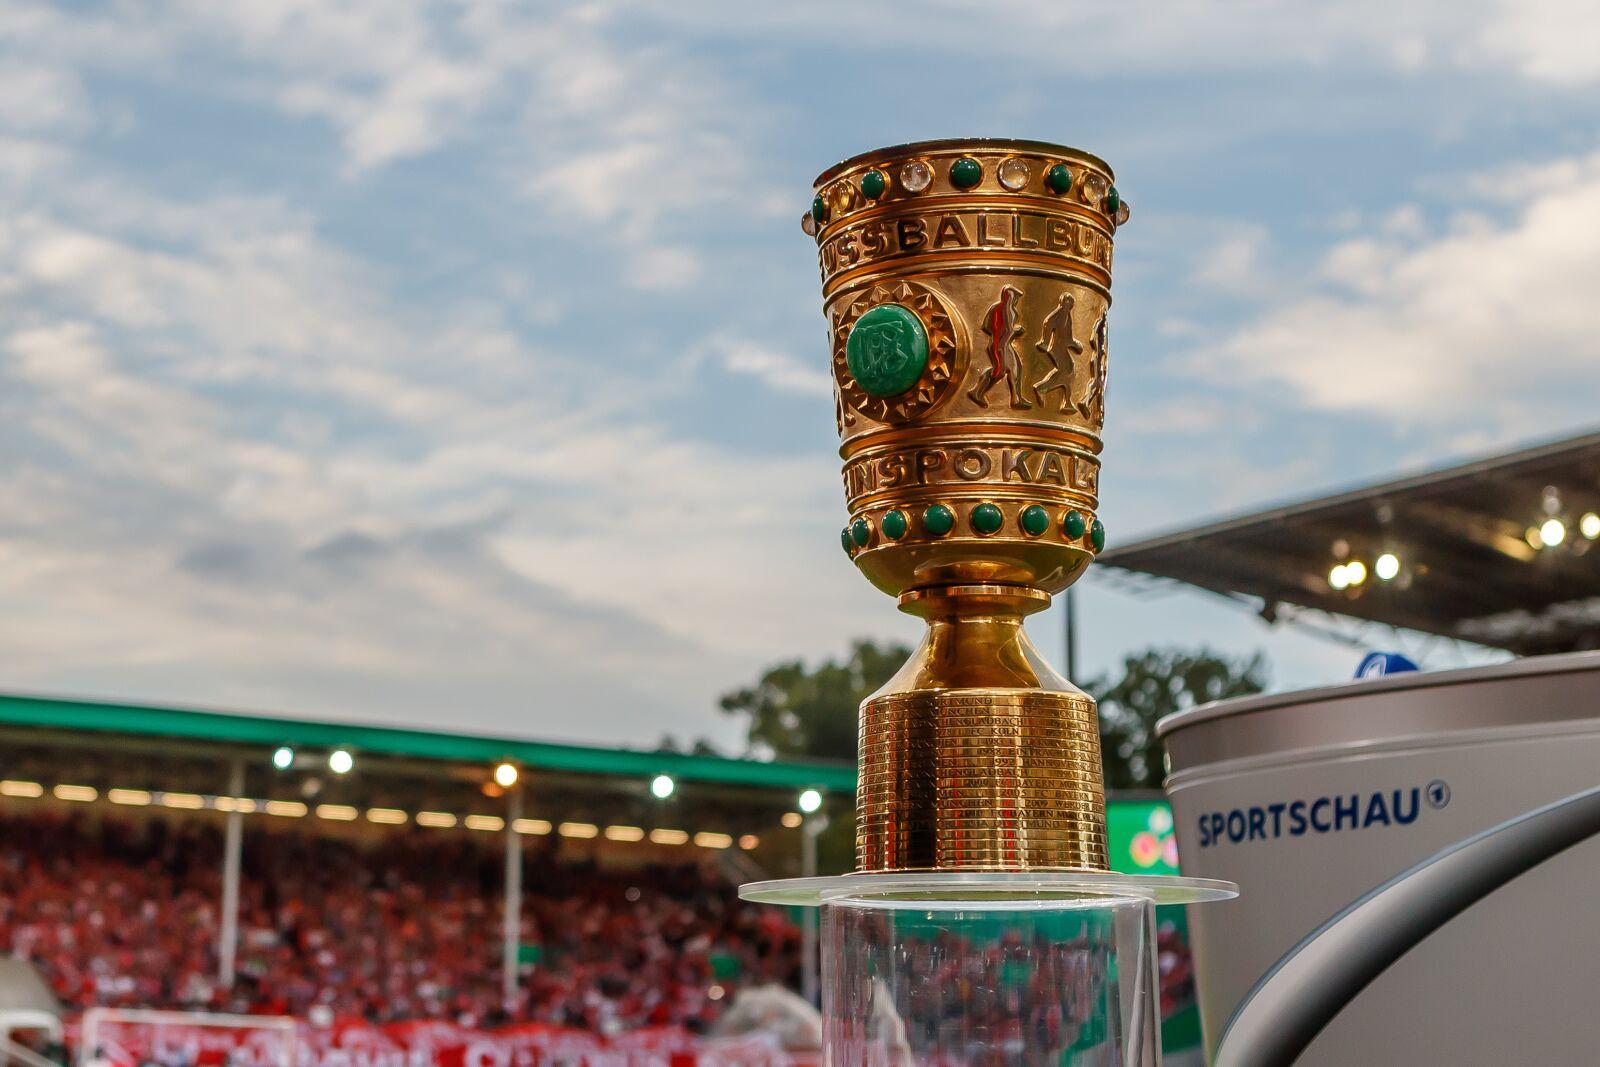 Bayern Munich face VfL Bochum in second round of DFB Pokal